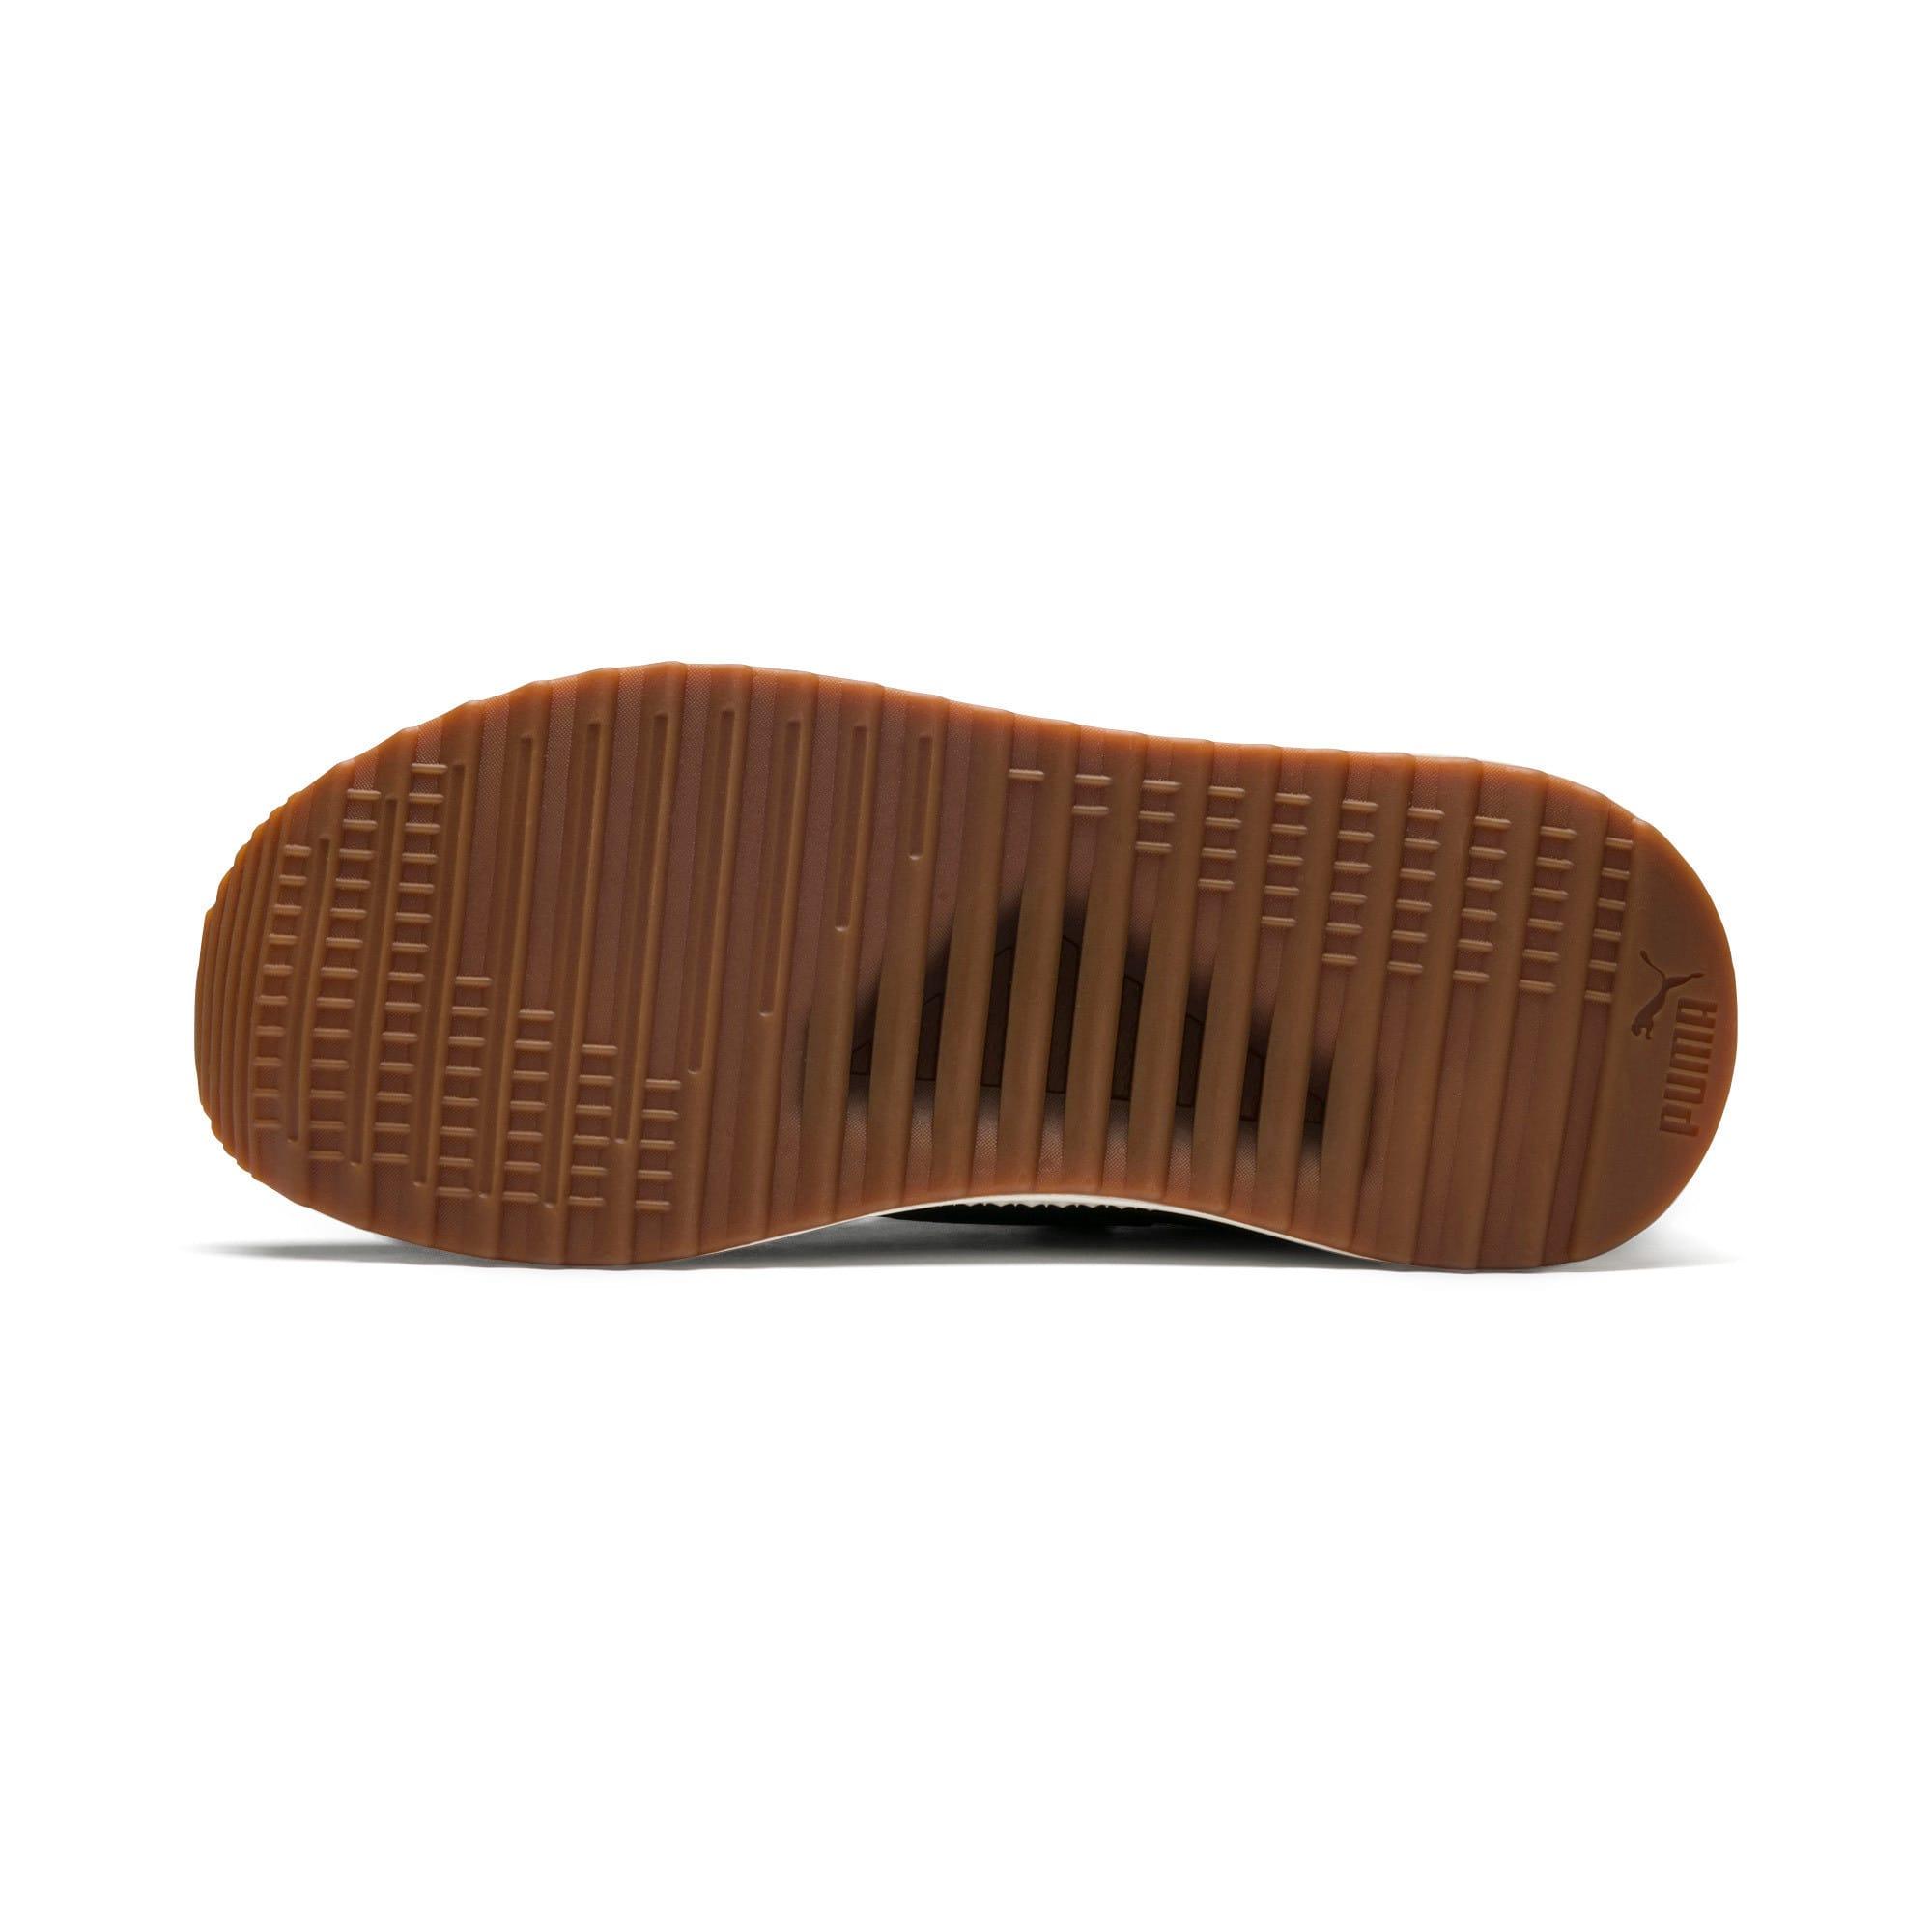 Thumbnail 3 of Pacer Next Cage Sneakers, P. Black-P. Black-Whis.White, medium